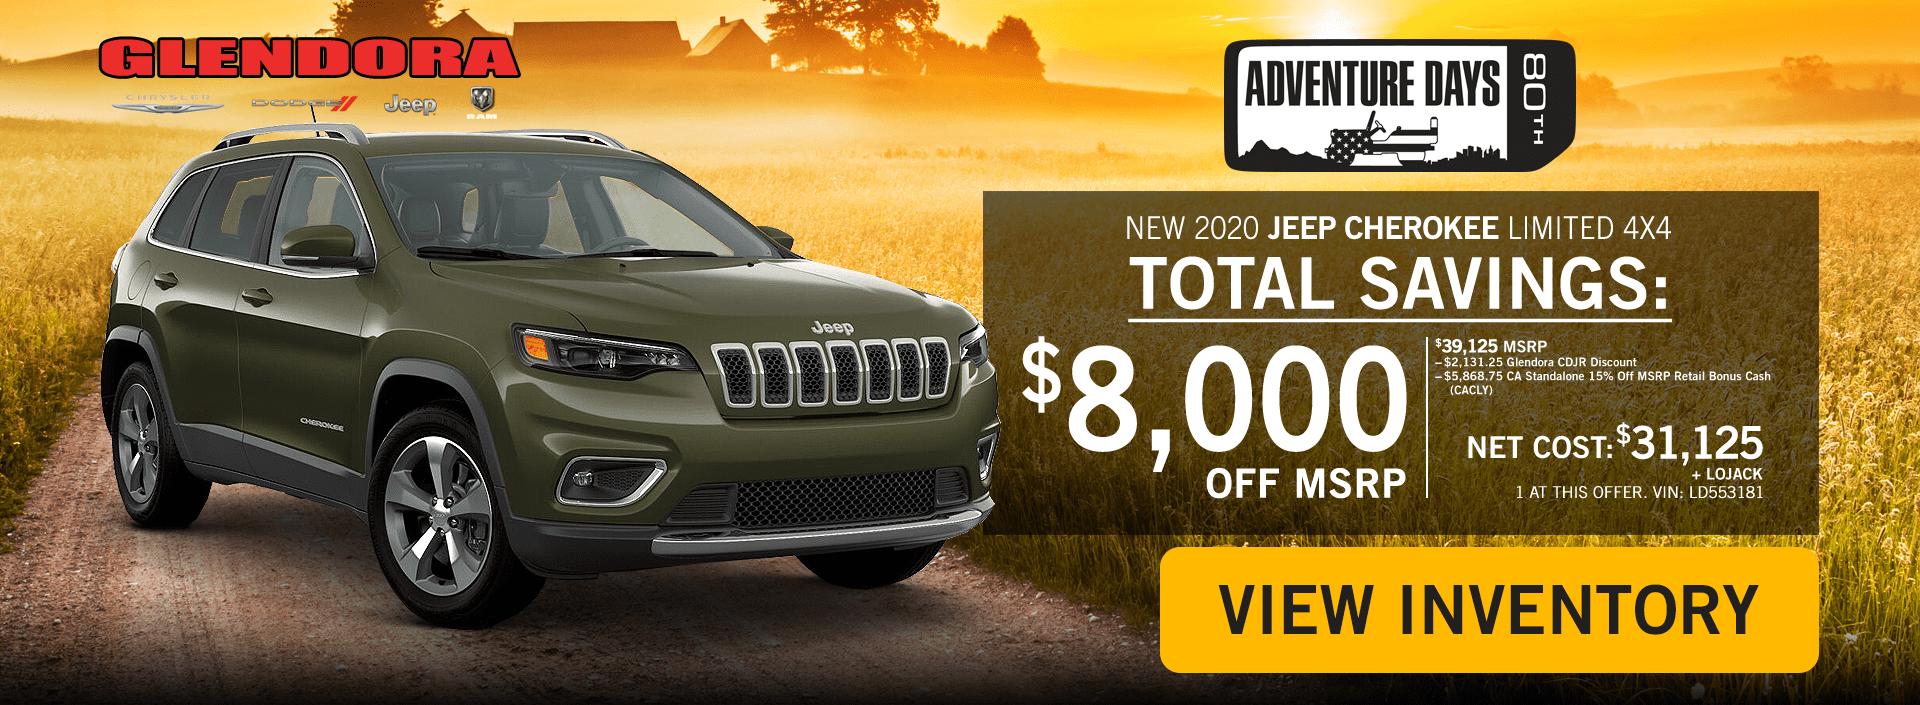 Glendora_CDJR_2020_October_Deals_Jeep_Adventure_Jeep_Cherokee_Home